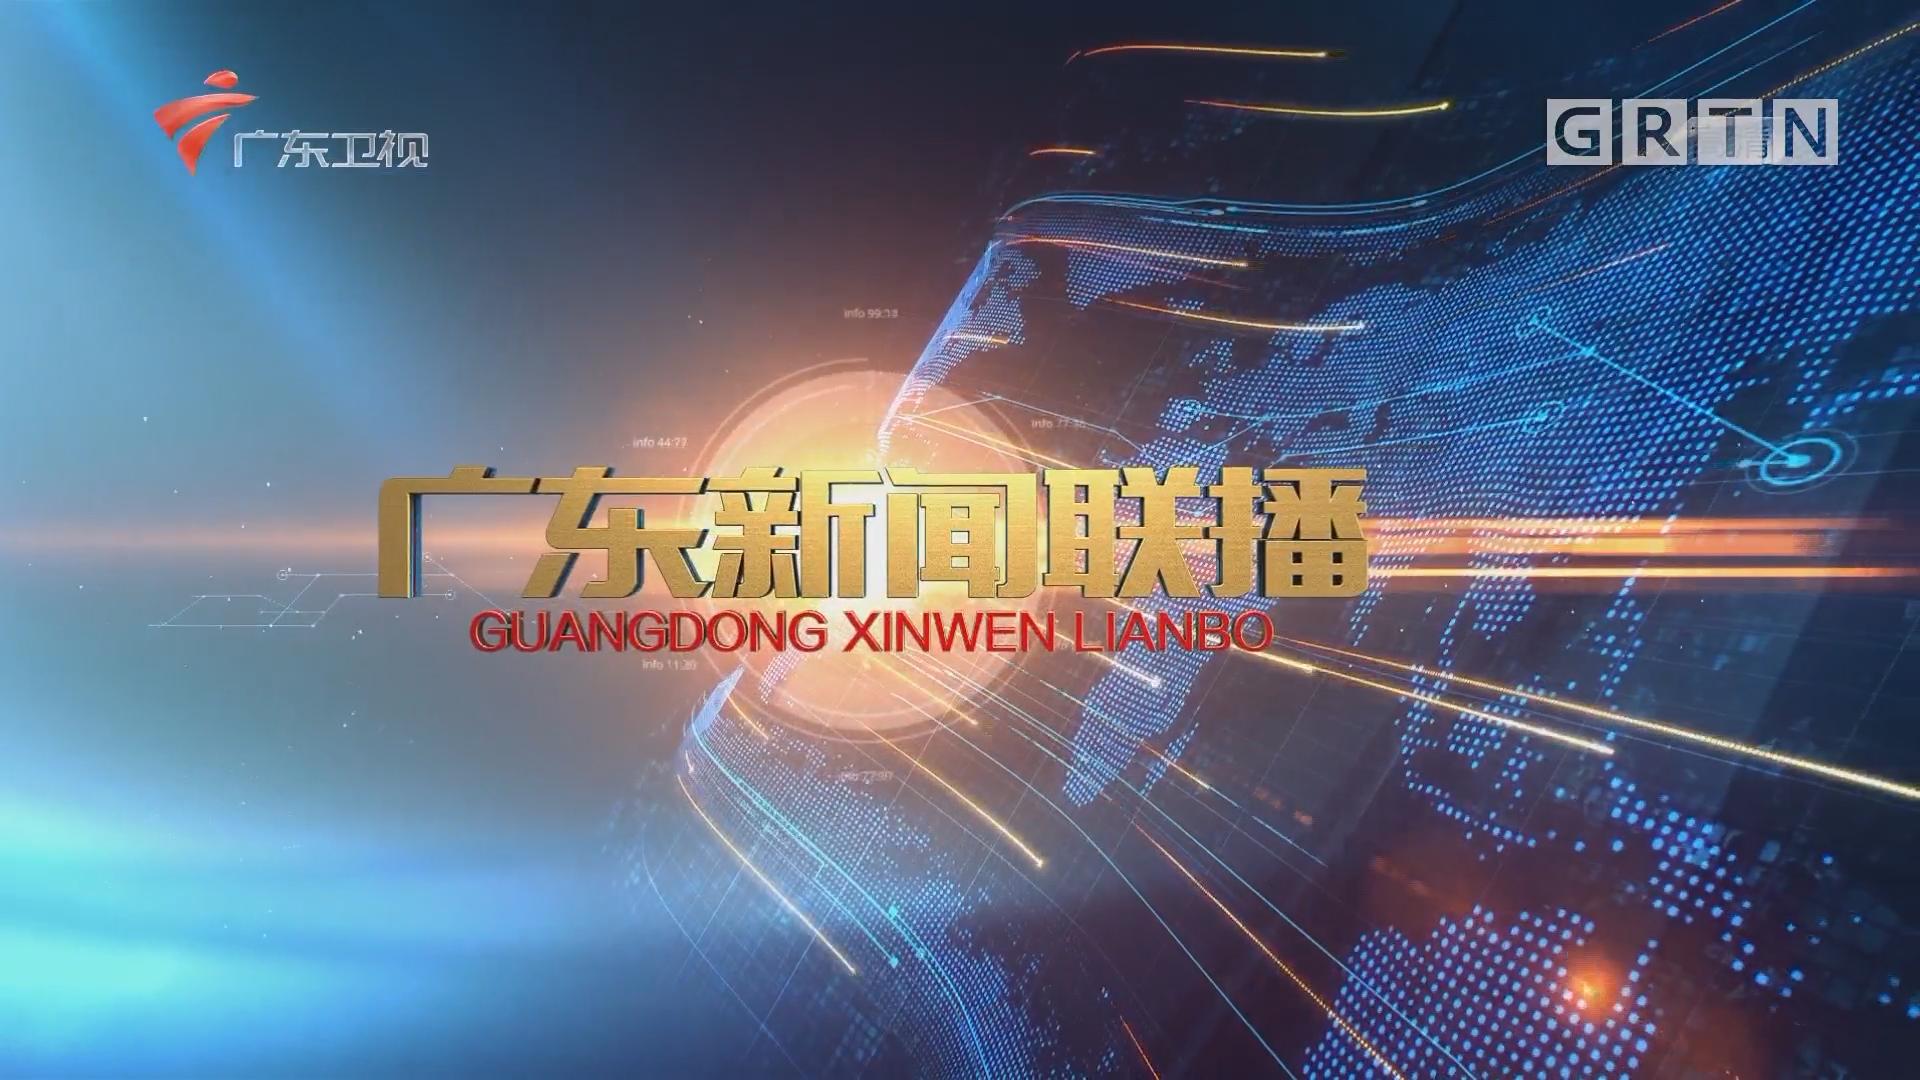 [HD][2018-11-19]广东新闻联播:省委常委会召开会议 李希主持会议